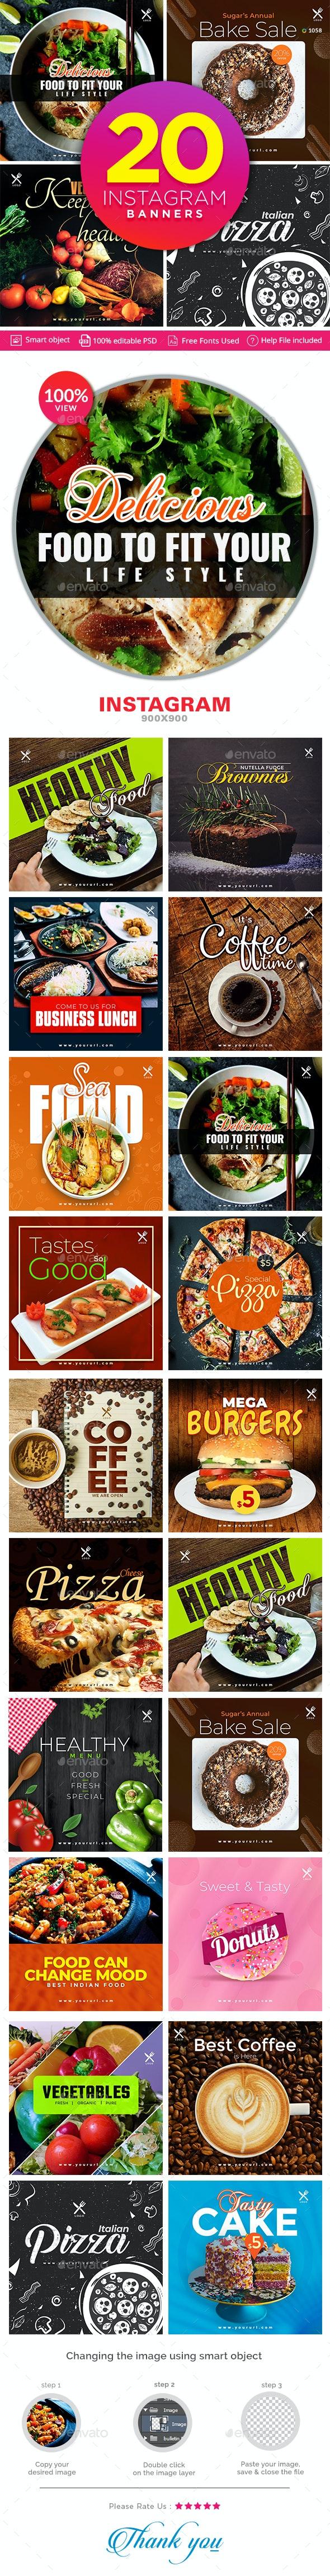 Food Instagram Templates - 20 Designs - Miscellaneous Social Media